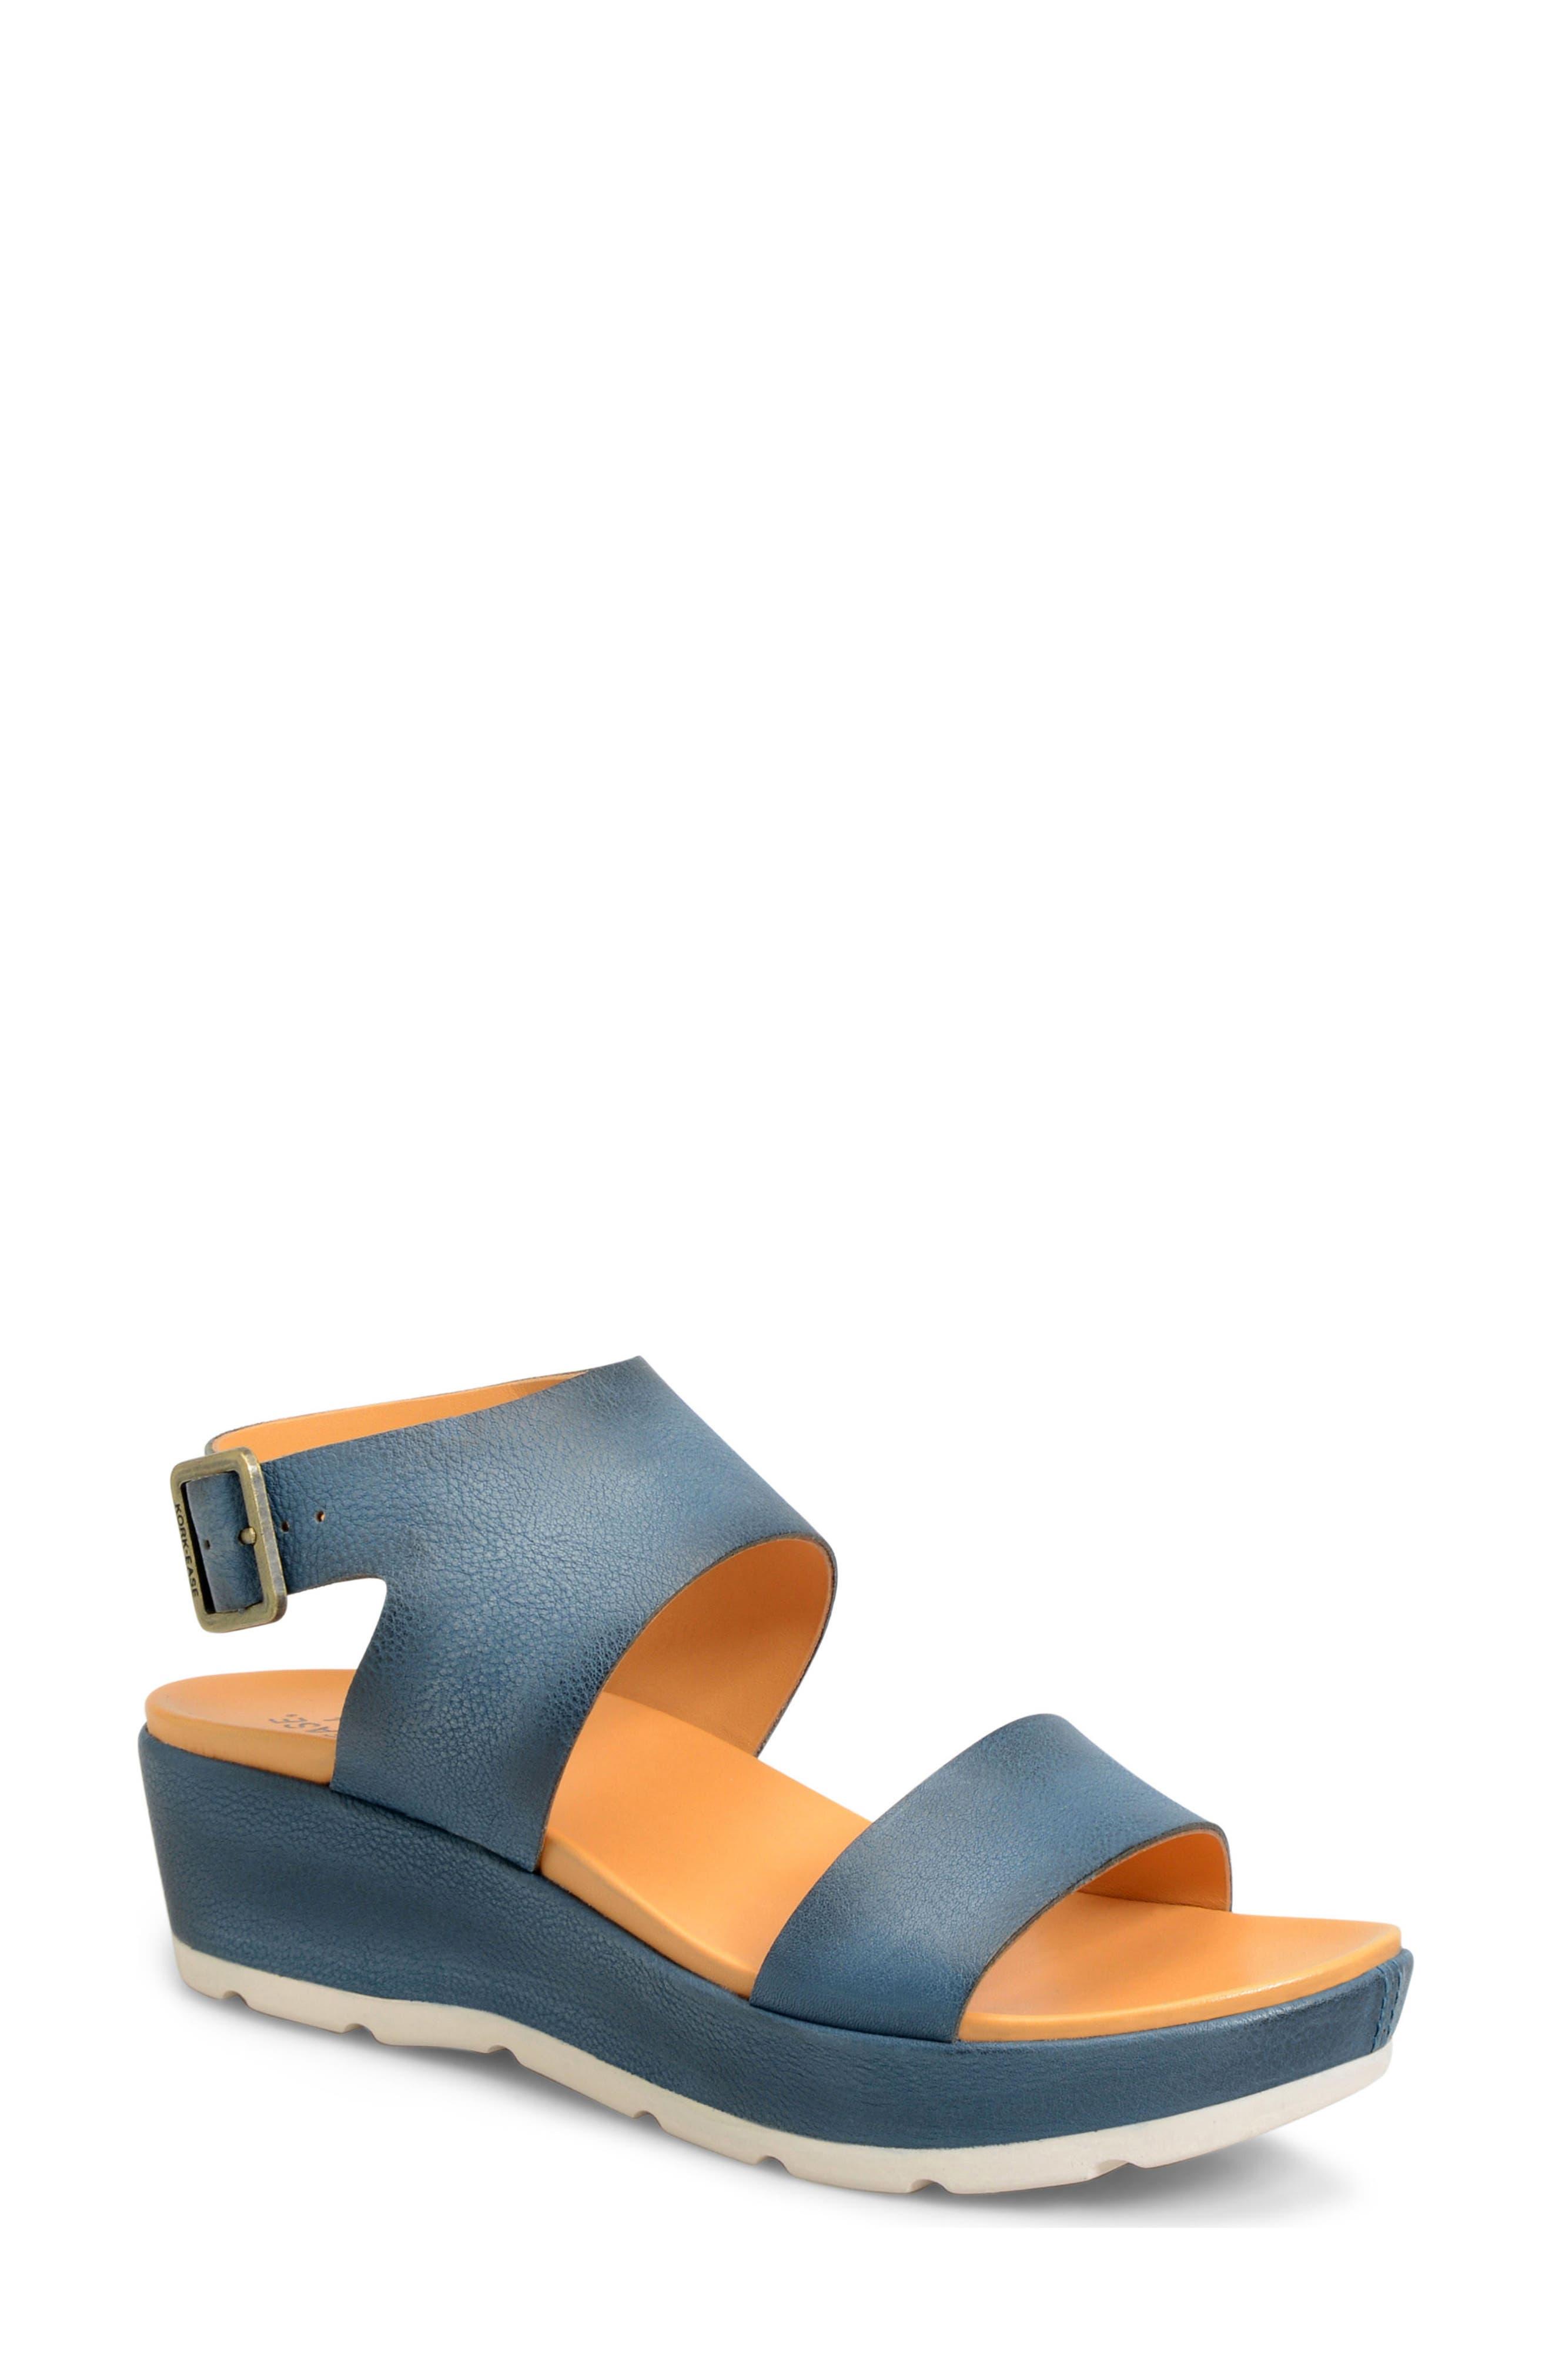 'Khloe' Platform Wedge Sandal,                             Main thumbnail 5, color,